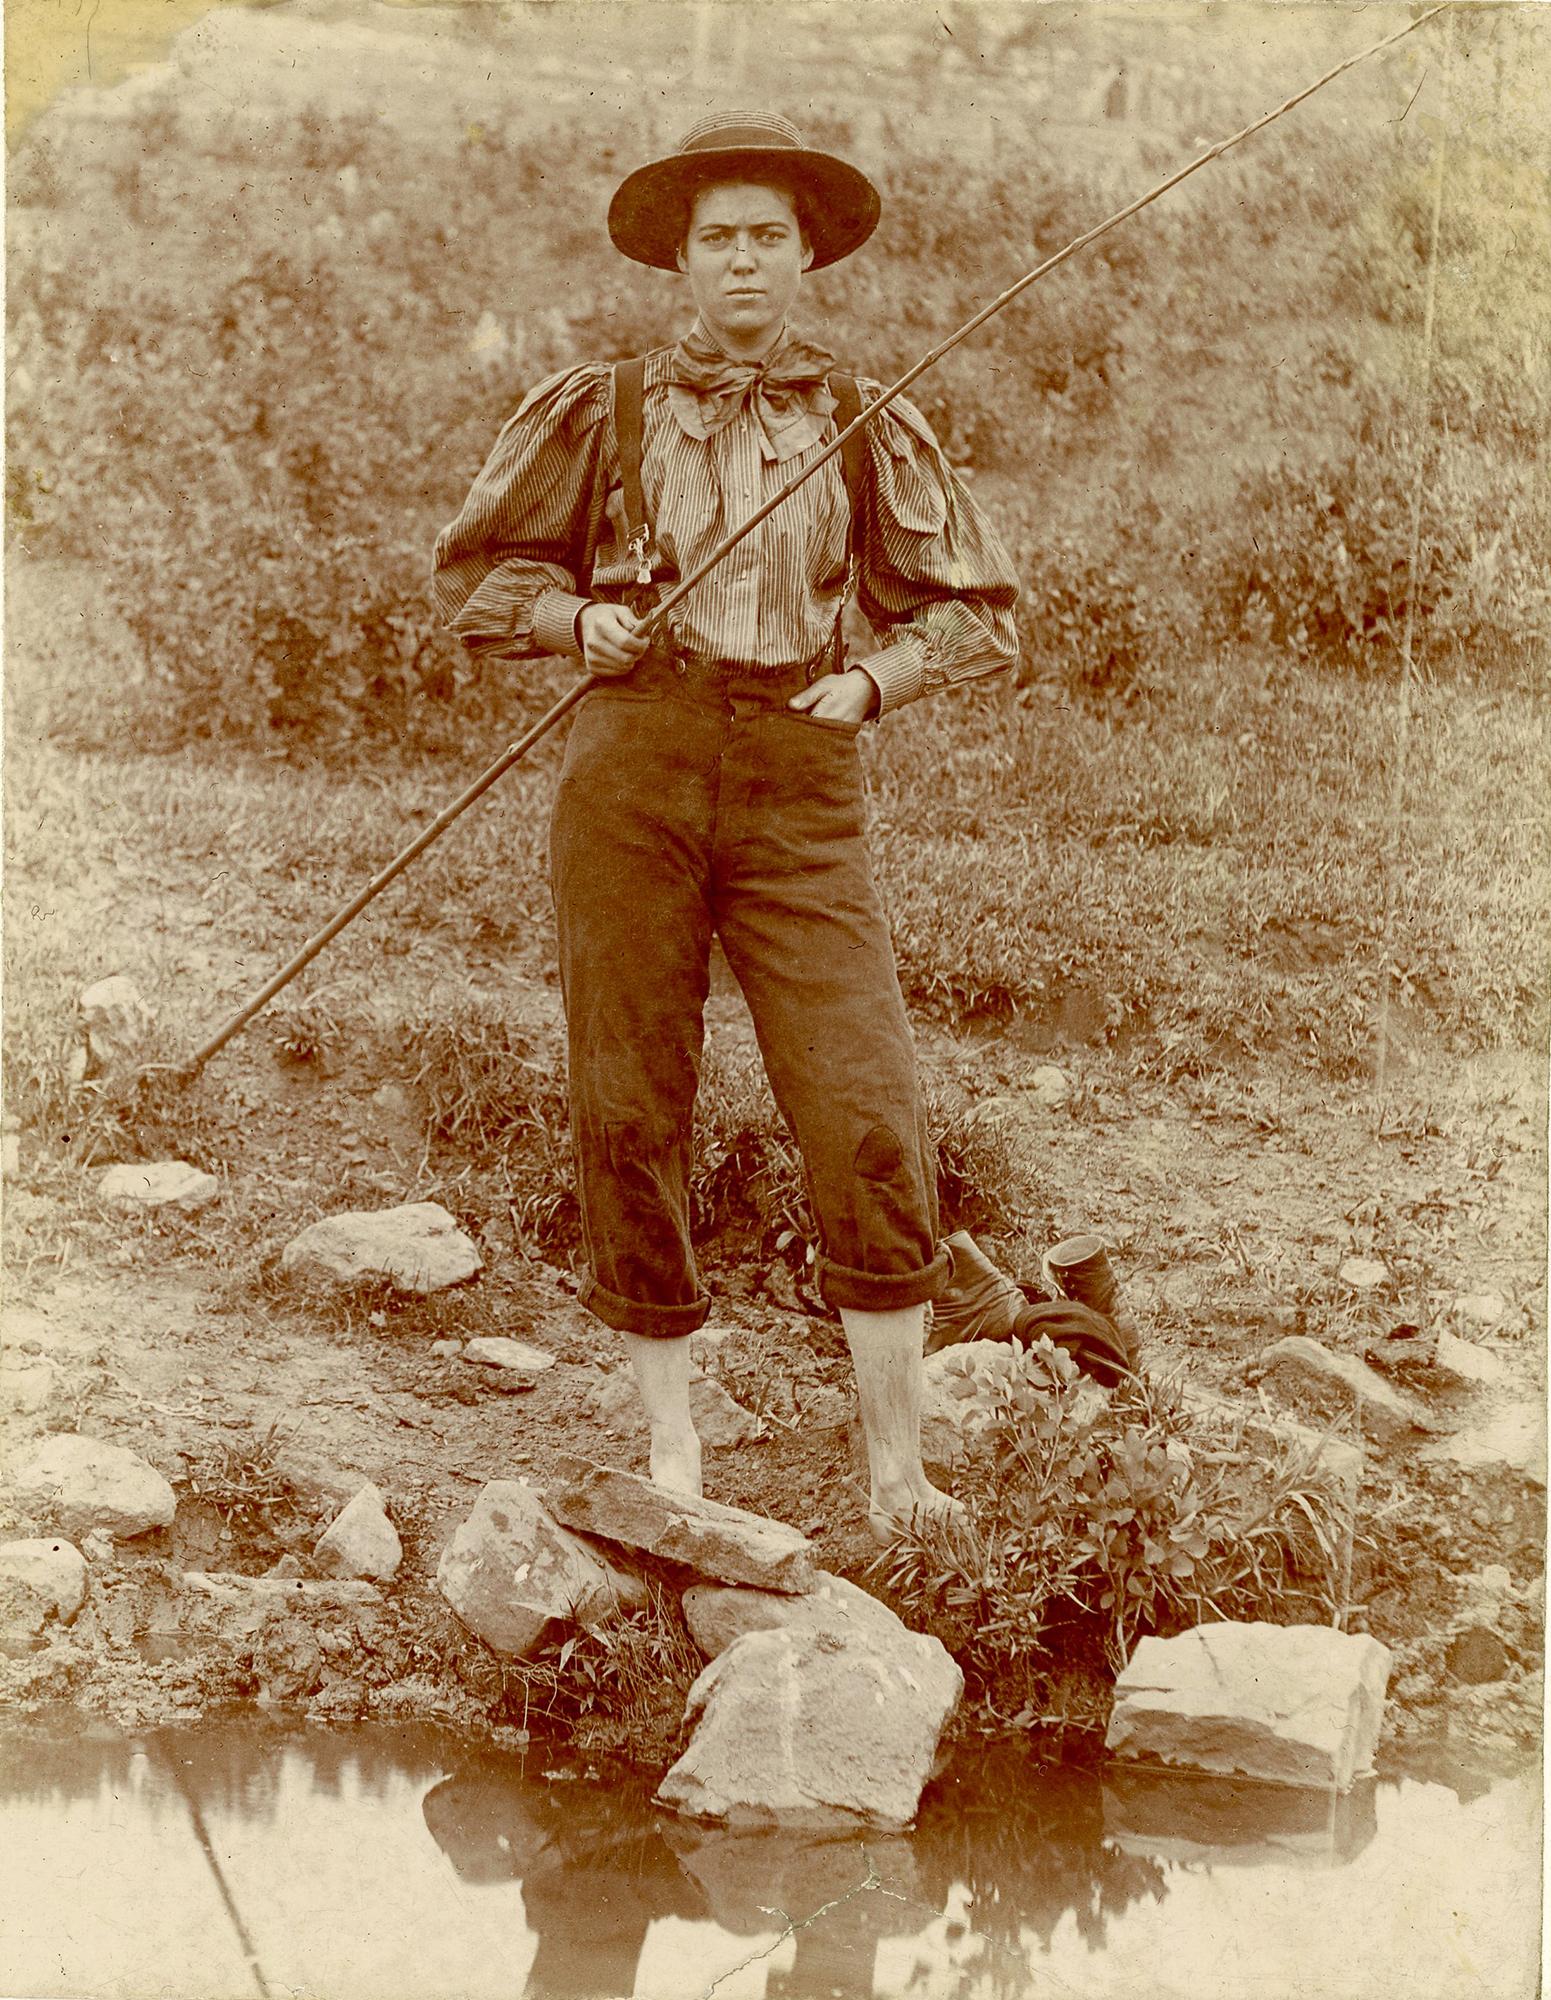 Albumen print of young woman fishing at Yellowstone Park, ca. 1895